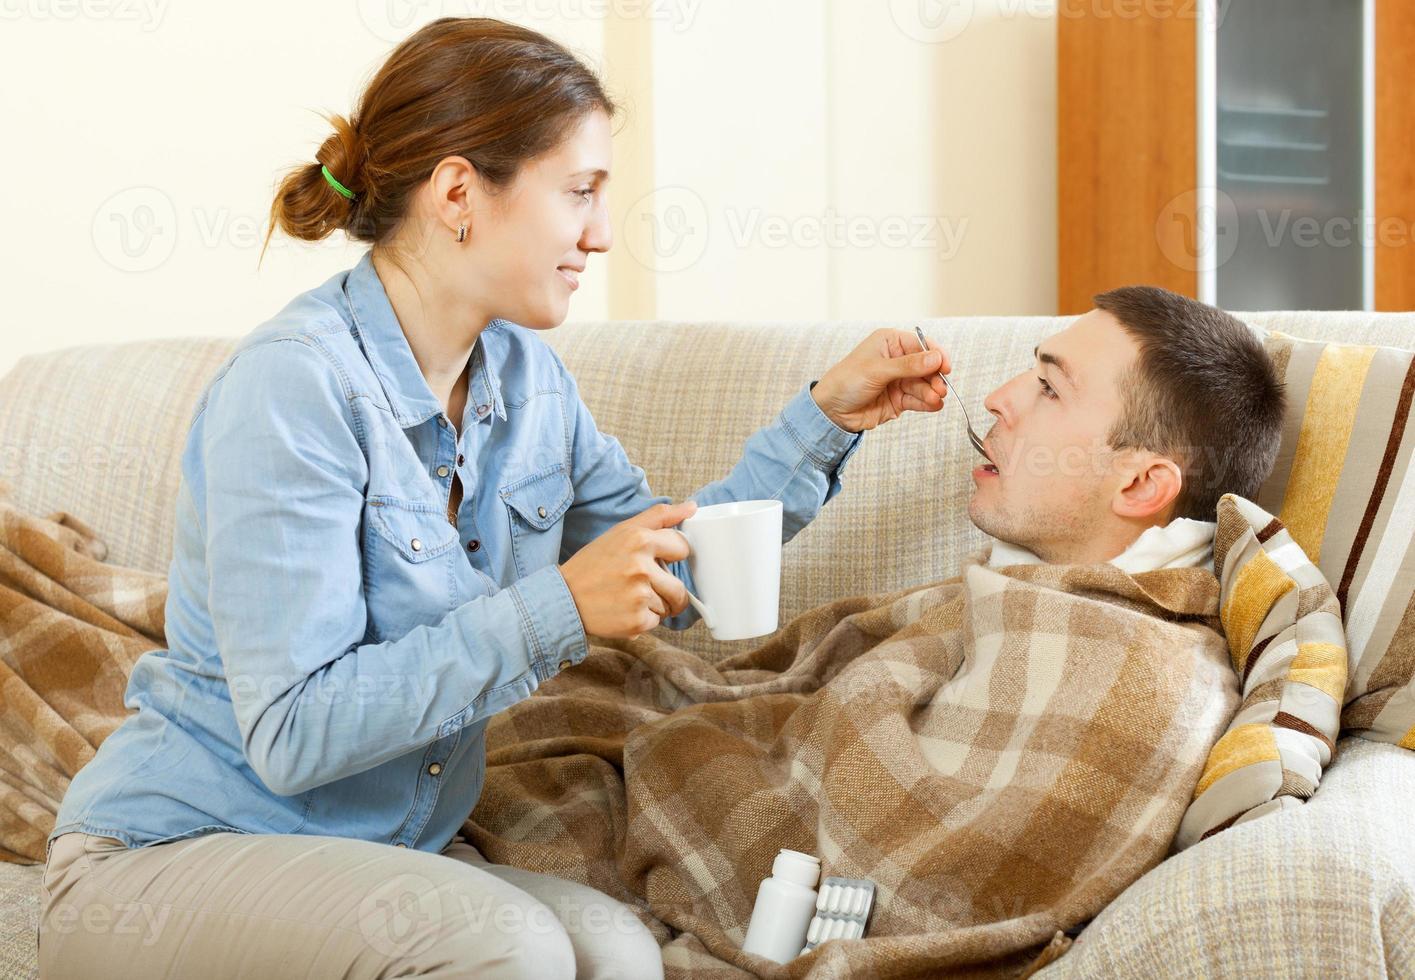 mulheres dando comprimidos para o marido foto